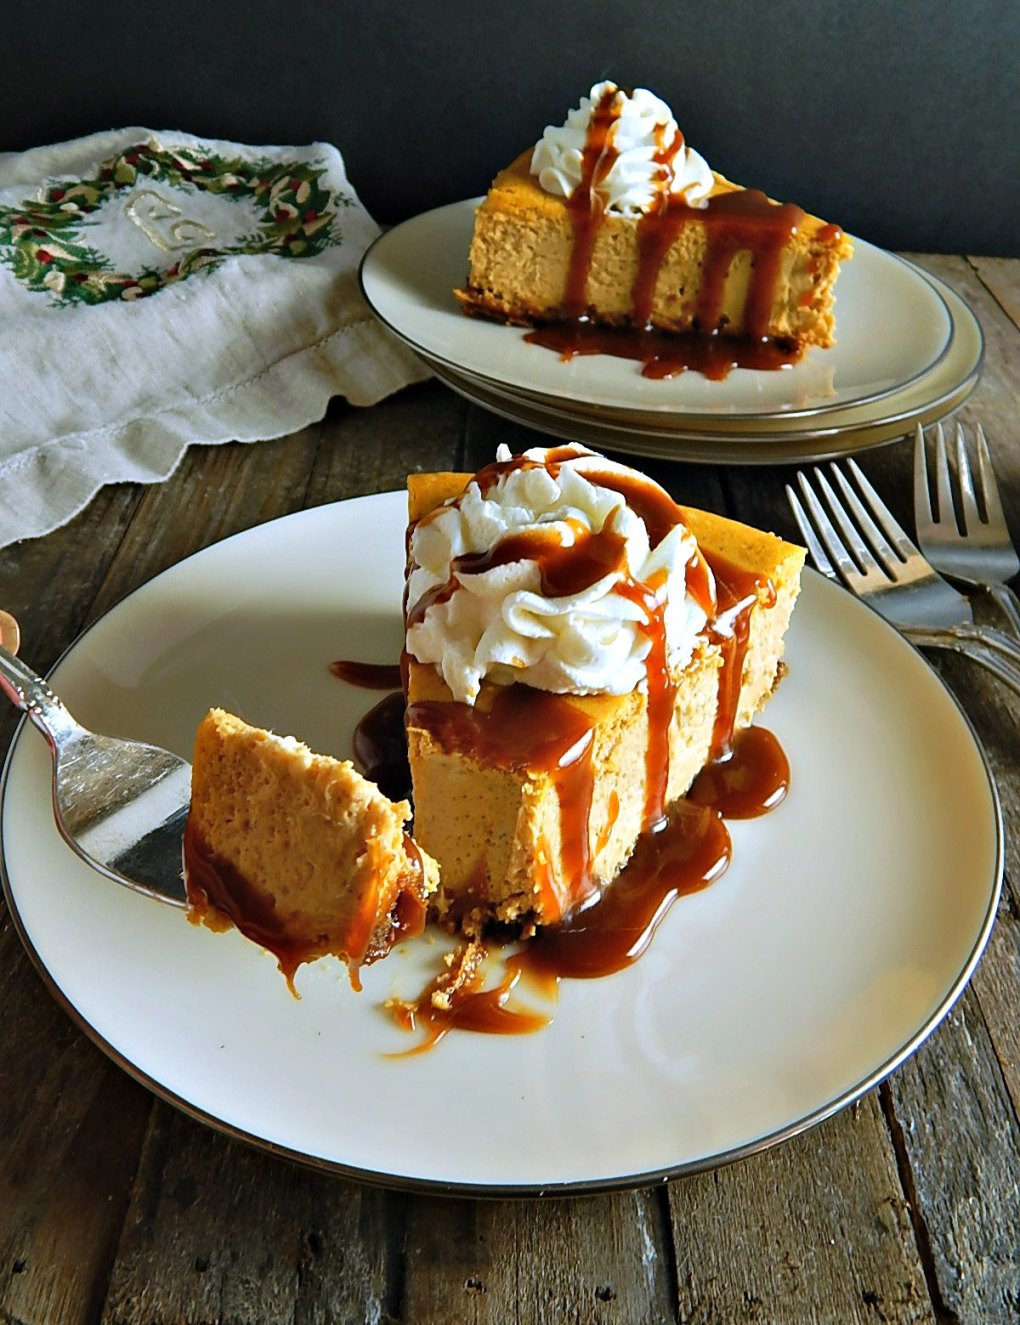 Martin Sheen's Pumpkin Cheesecake